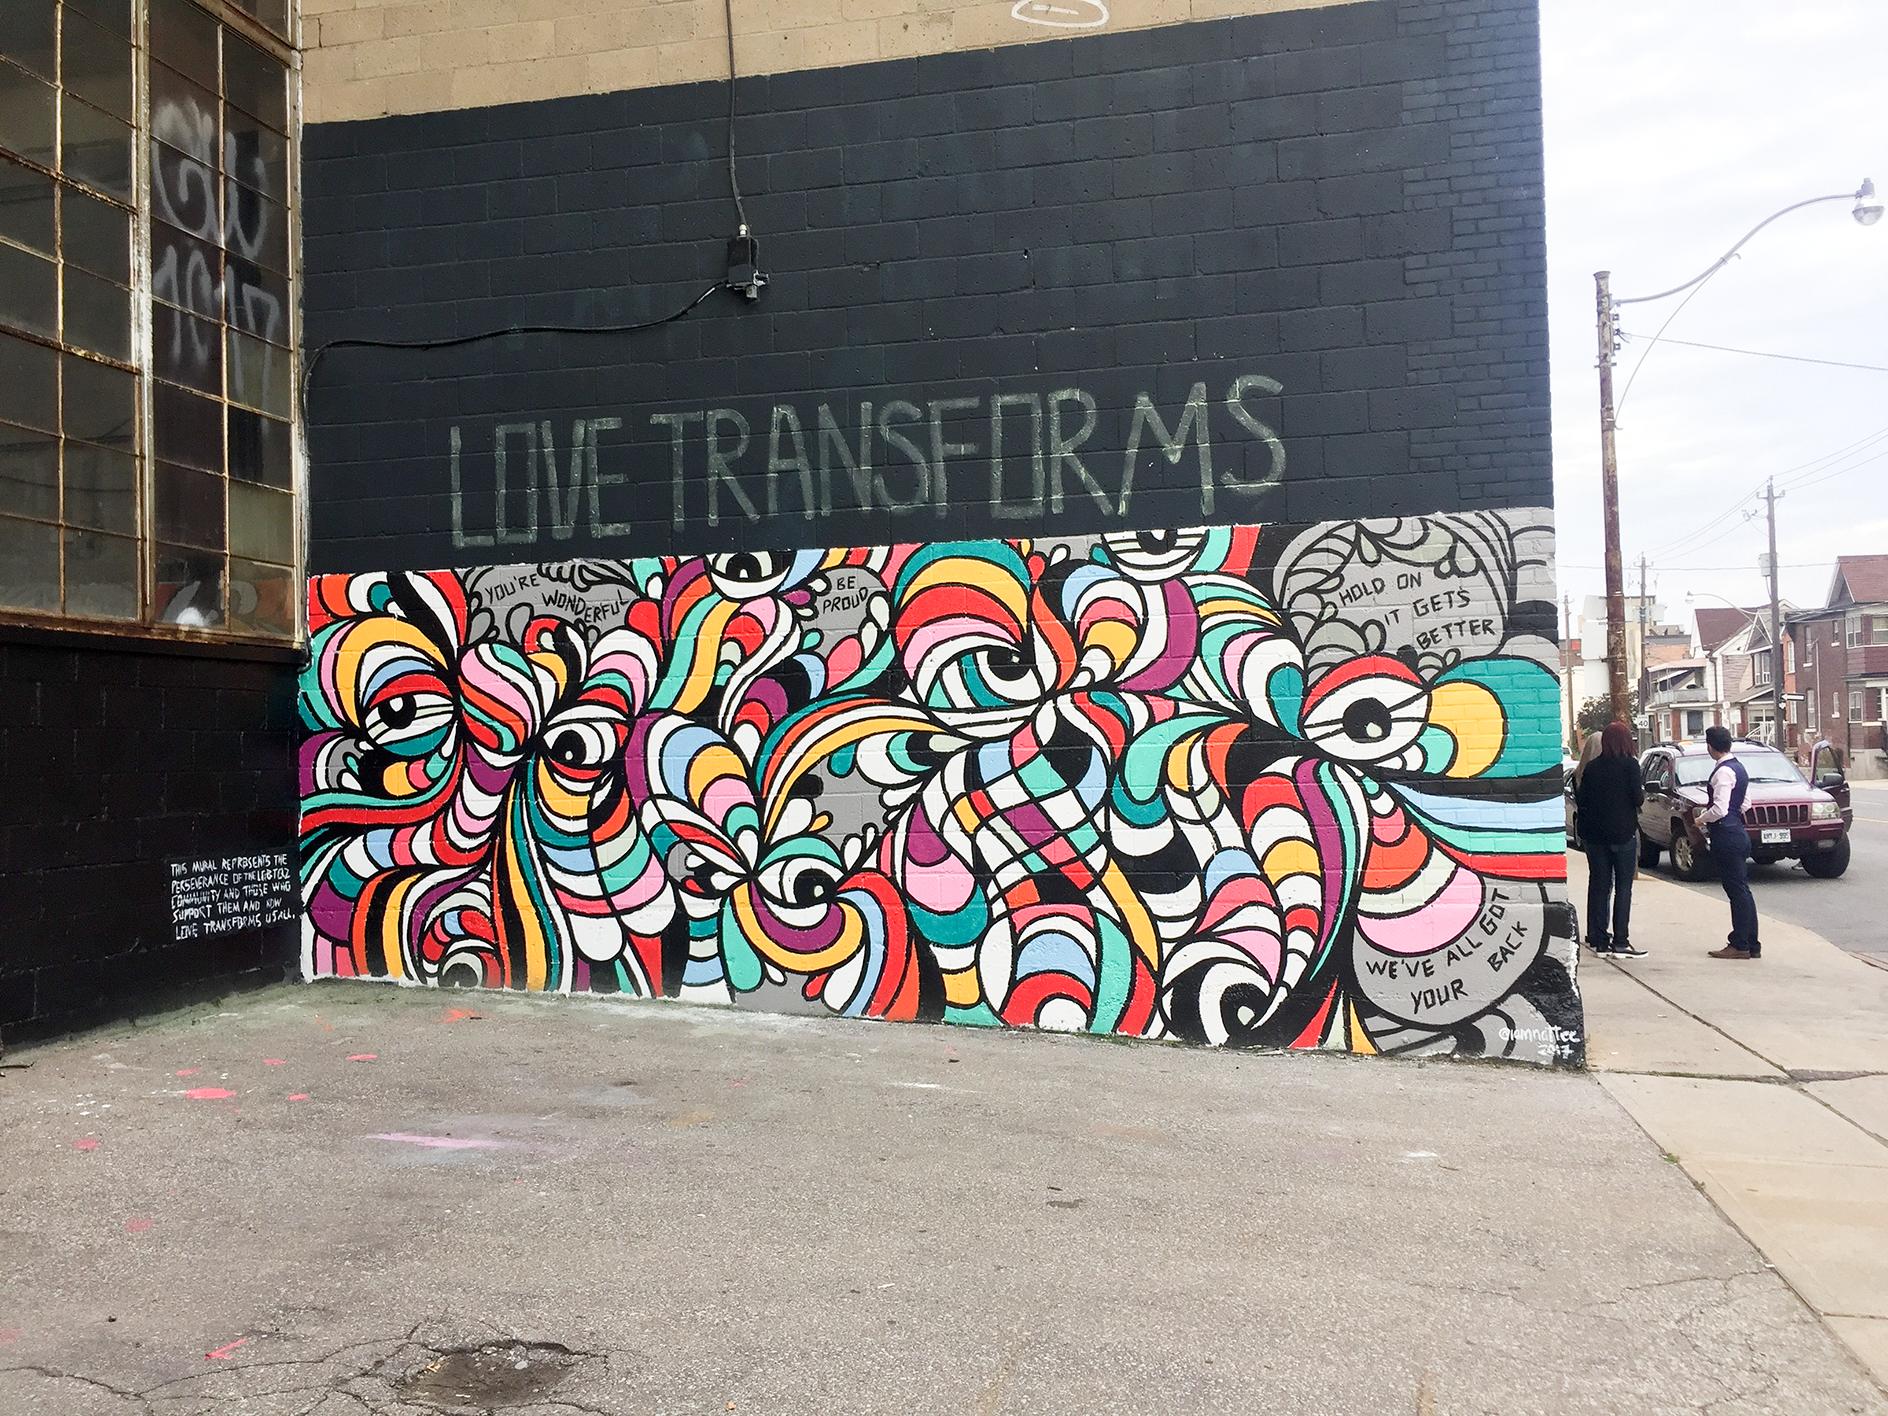 love transforms mural